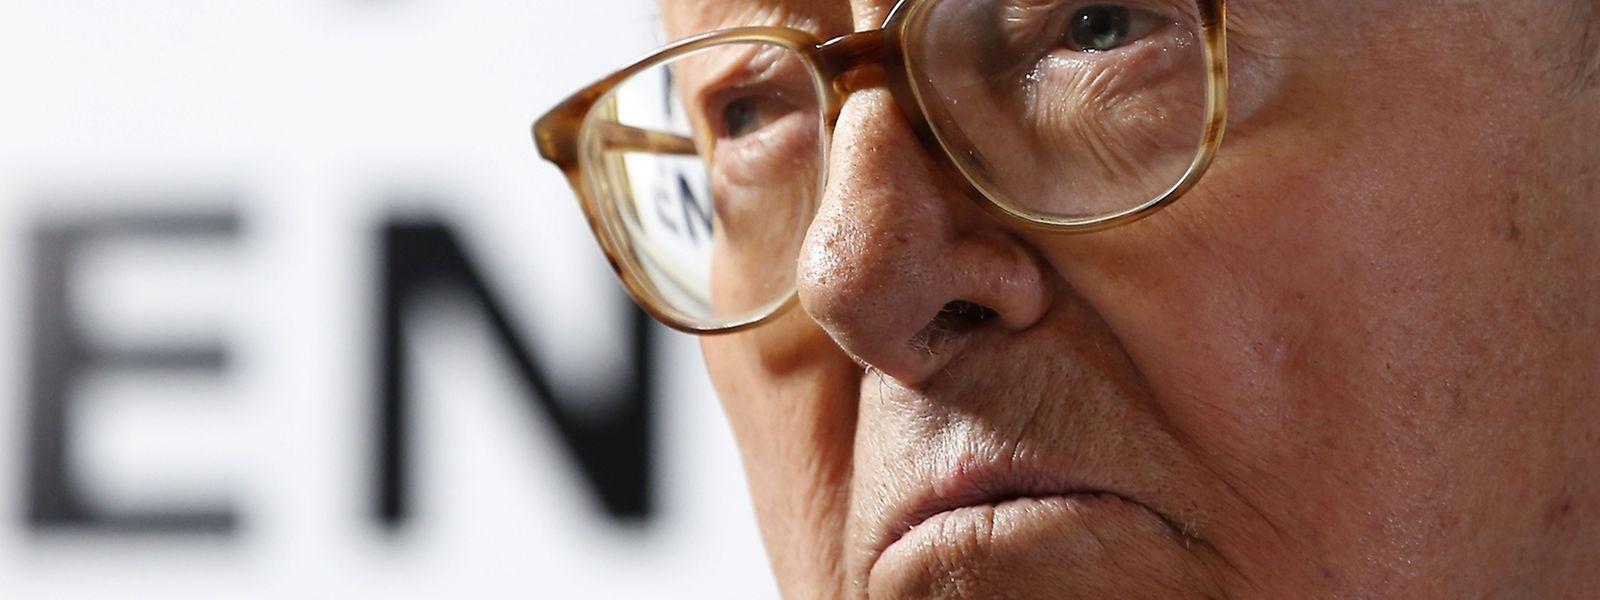 Le Pen muss insgesamt 35.000 Euro Strafe zahlen.